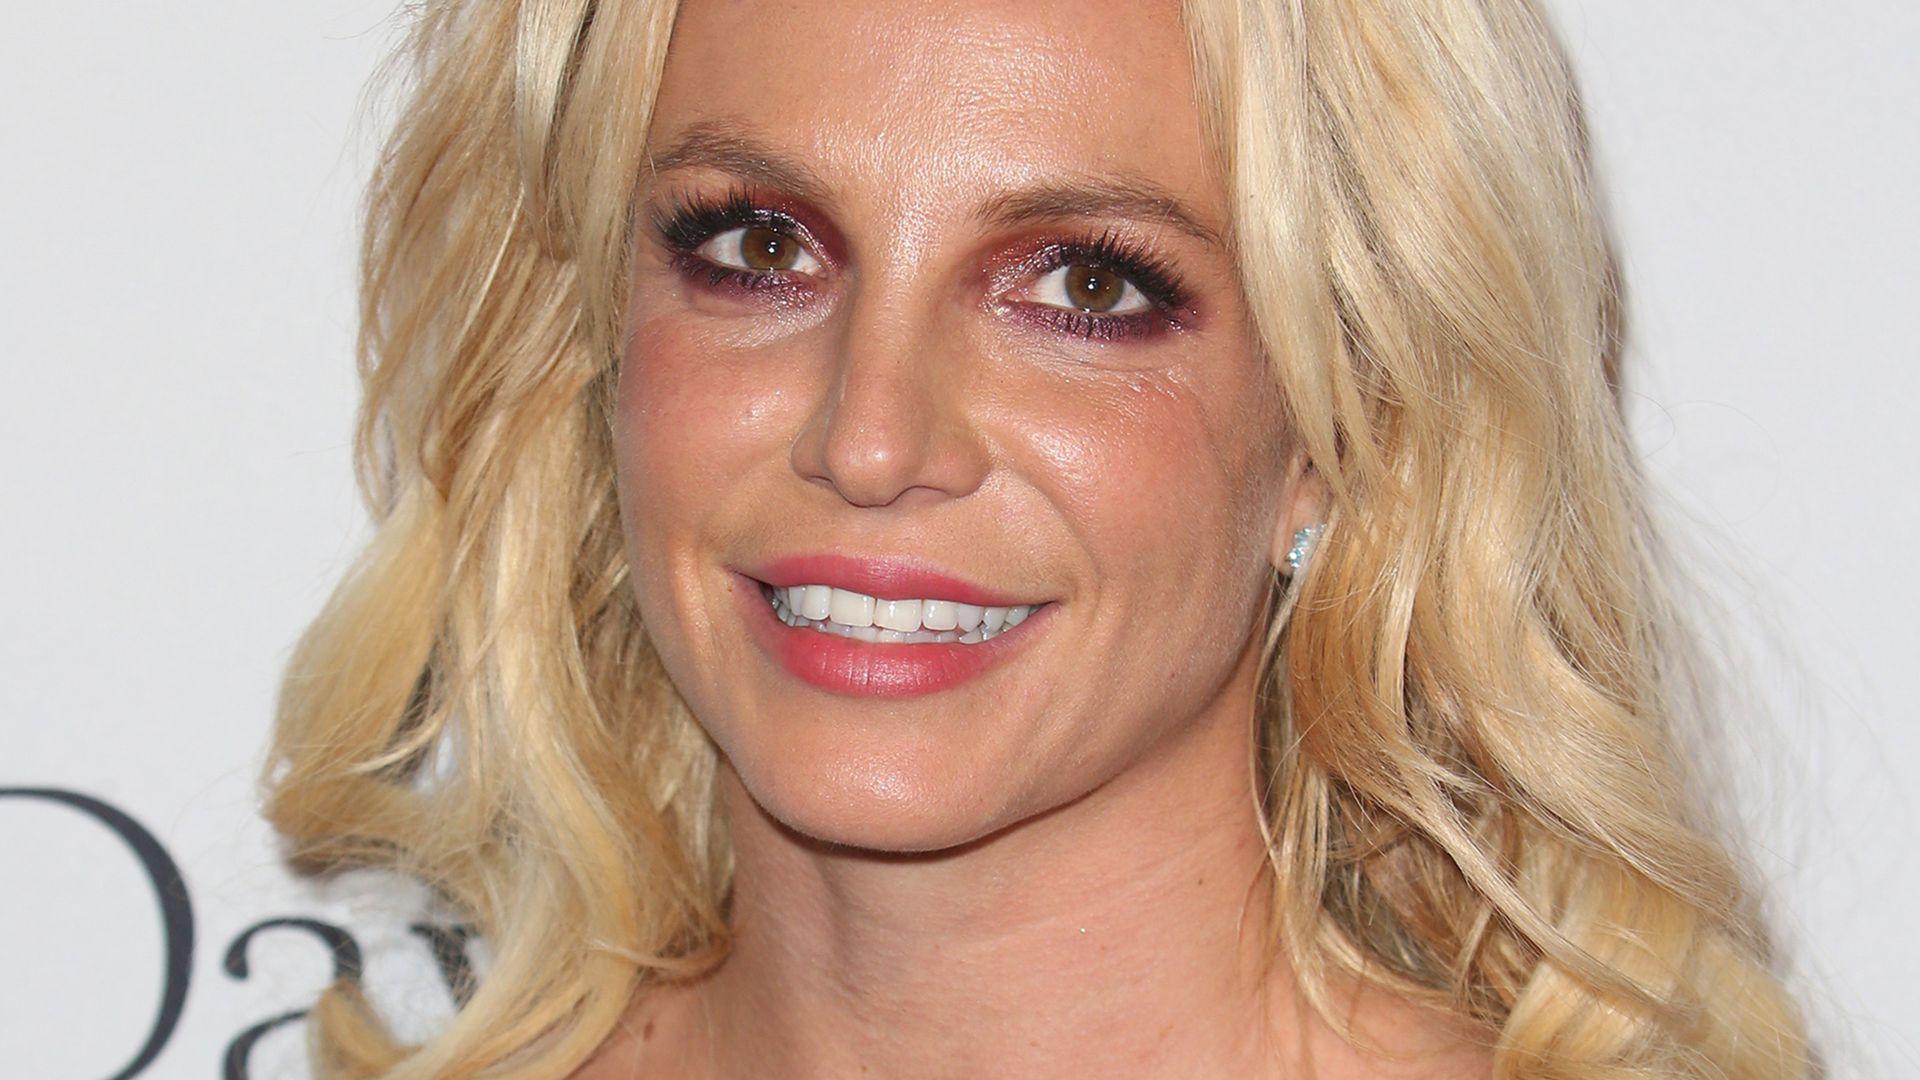 Britney spears pussy - 22 Bilder - xHamstercom